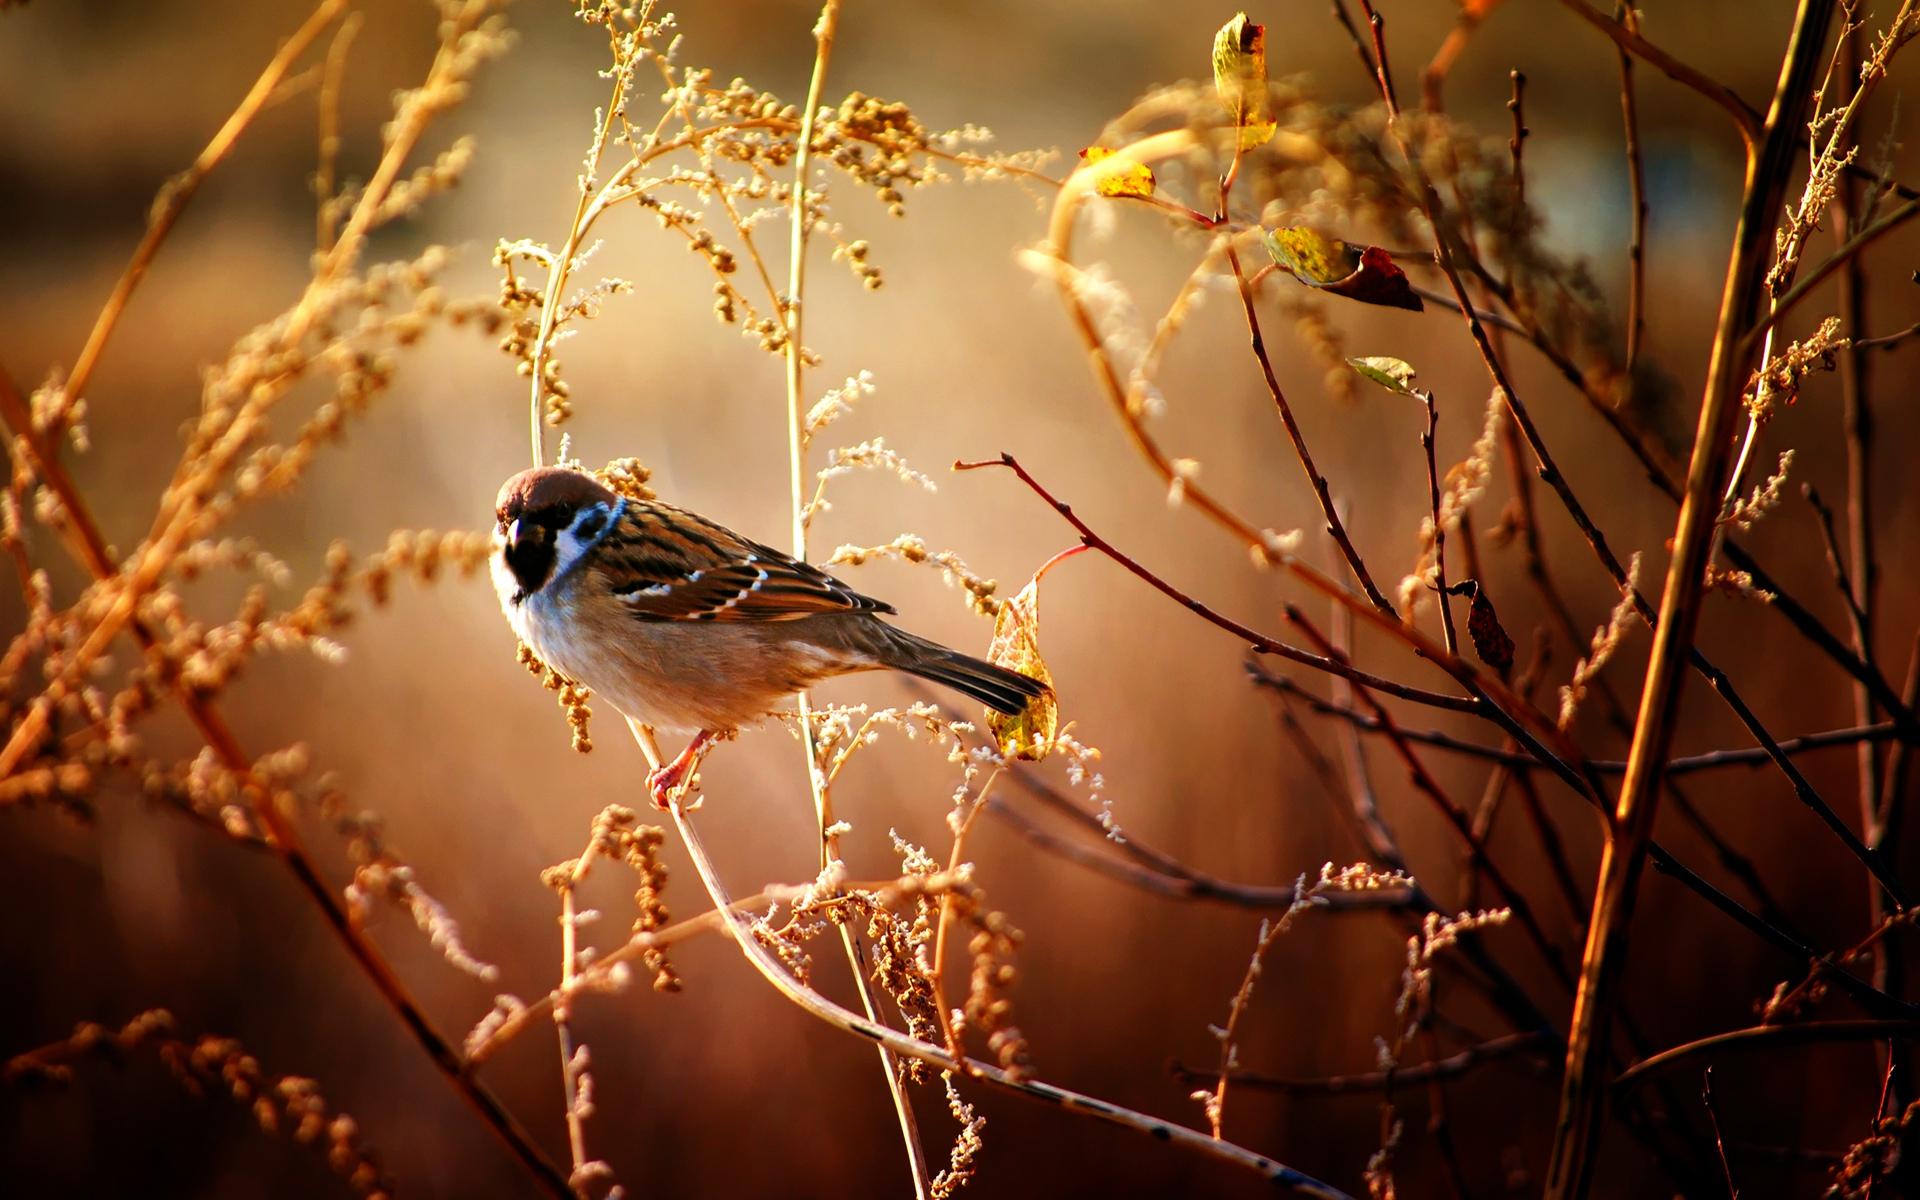 Download Nature Bird HD Wallpaper 1920x1200